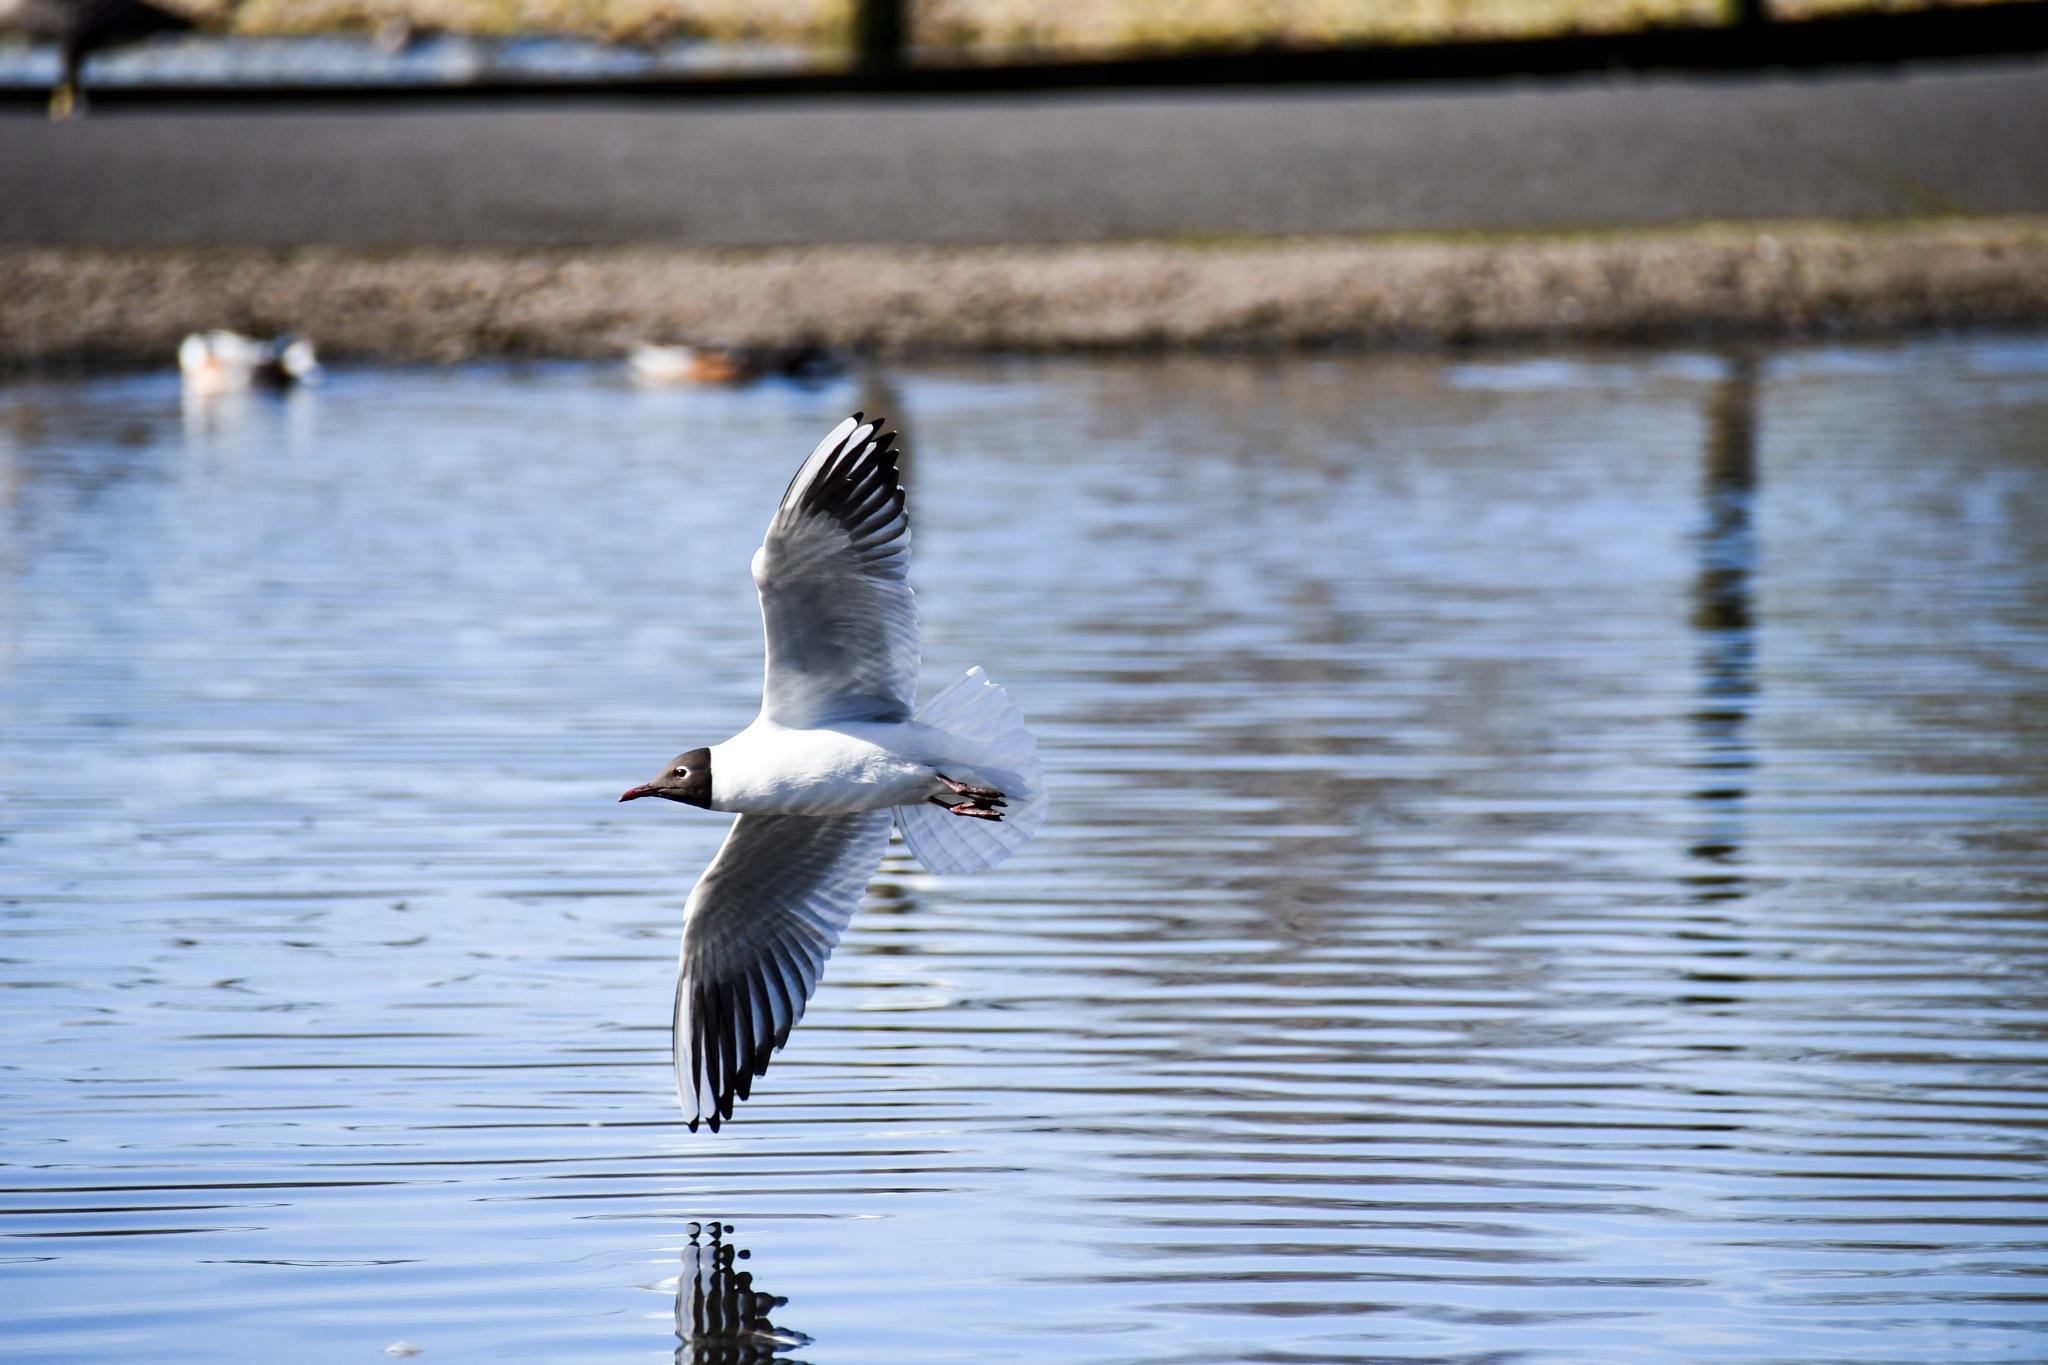 Swoosh by Chris Williams